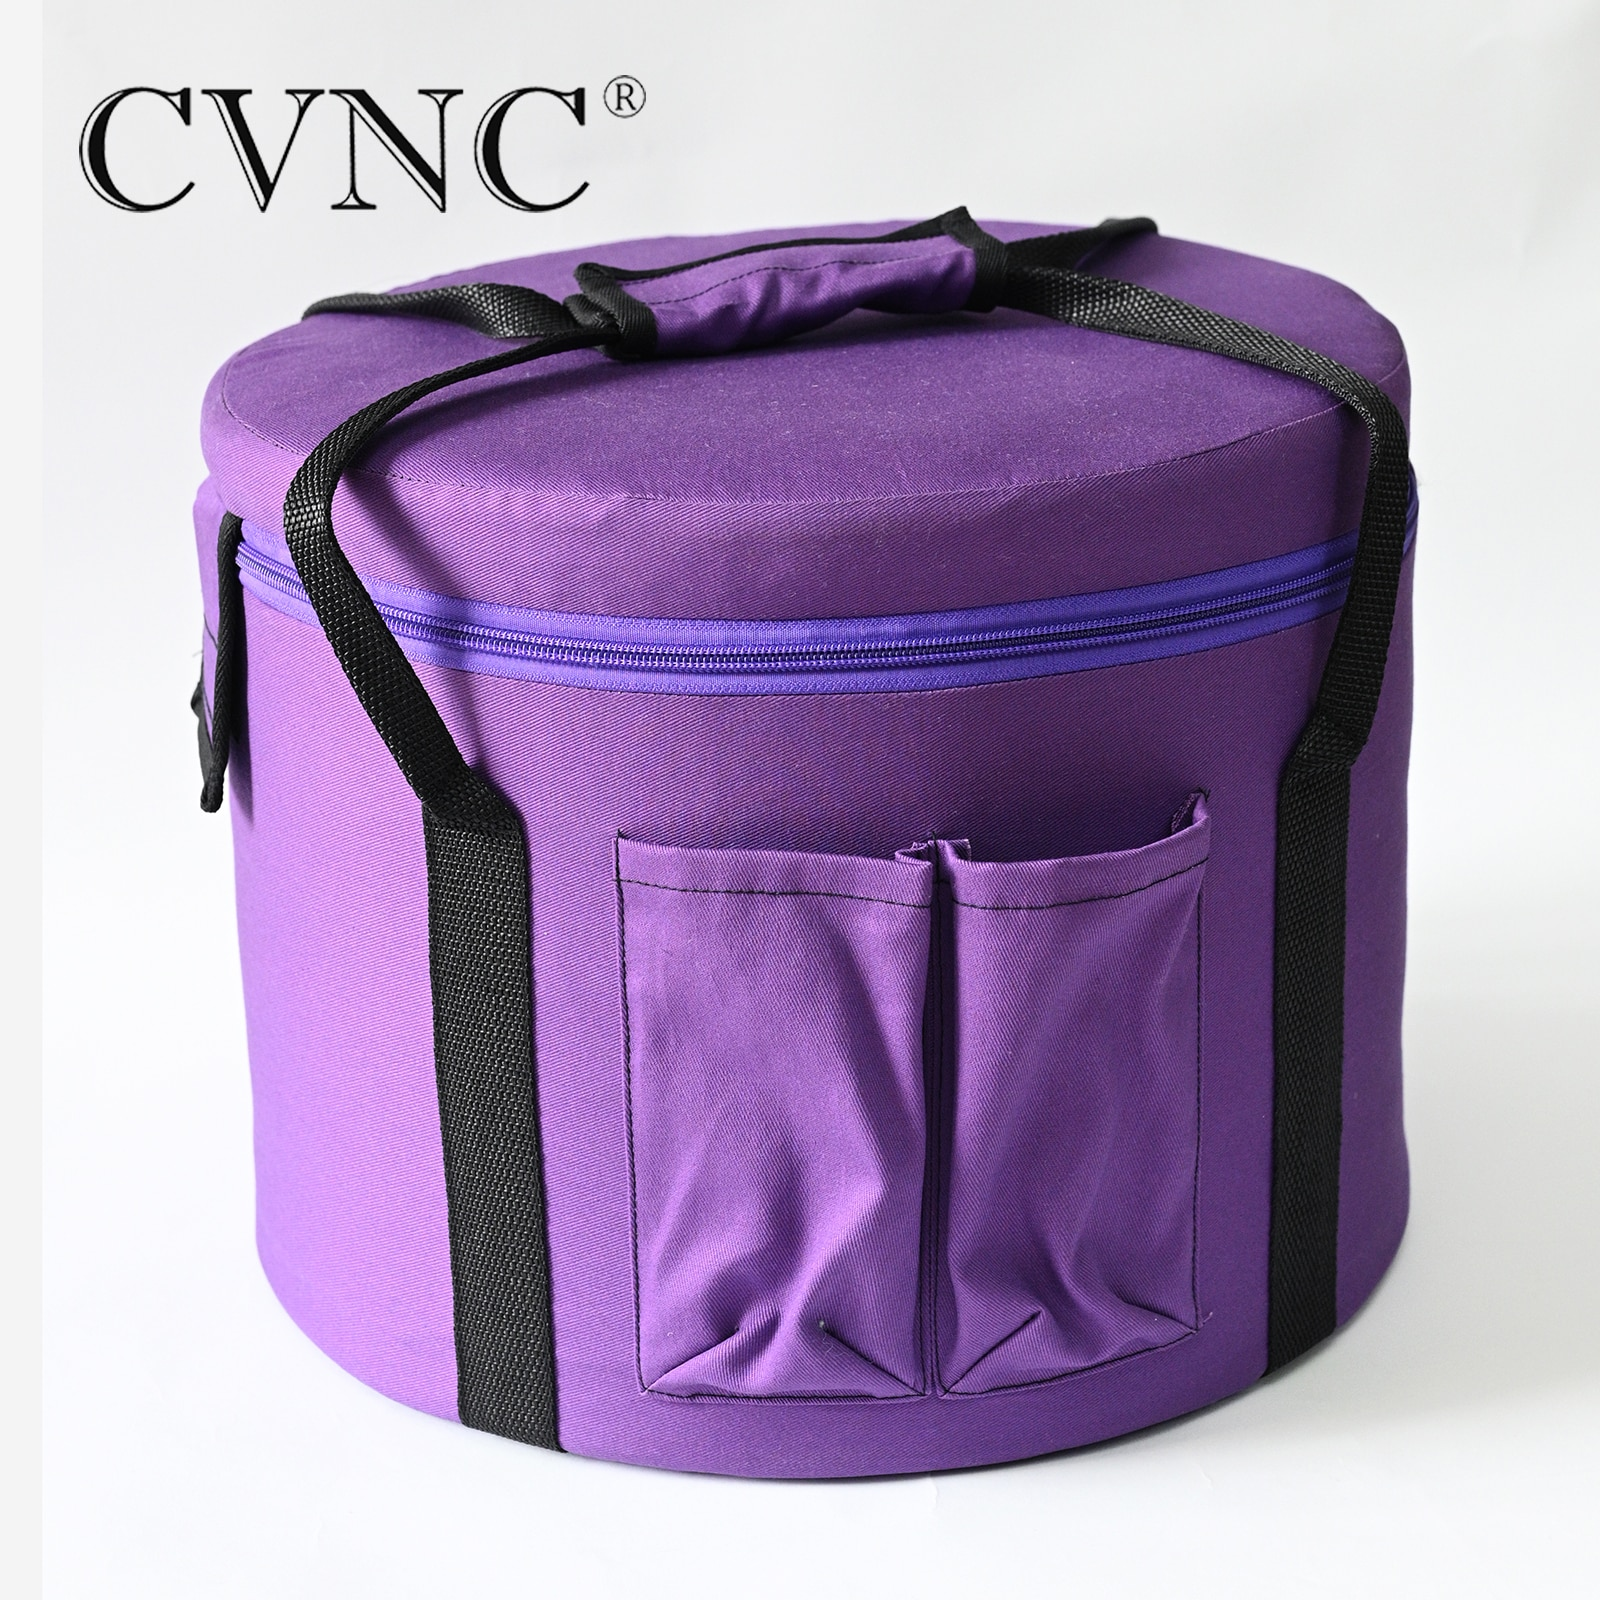 "Cvnc lona transportadora saco 11 ""para 7"" 9 ""11"" cristal cantando tigelas"